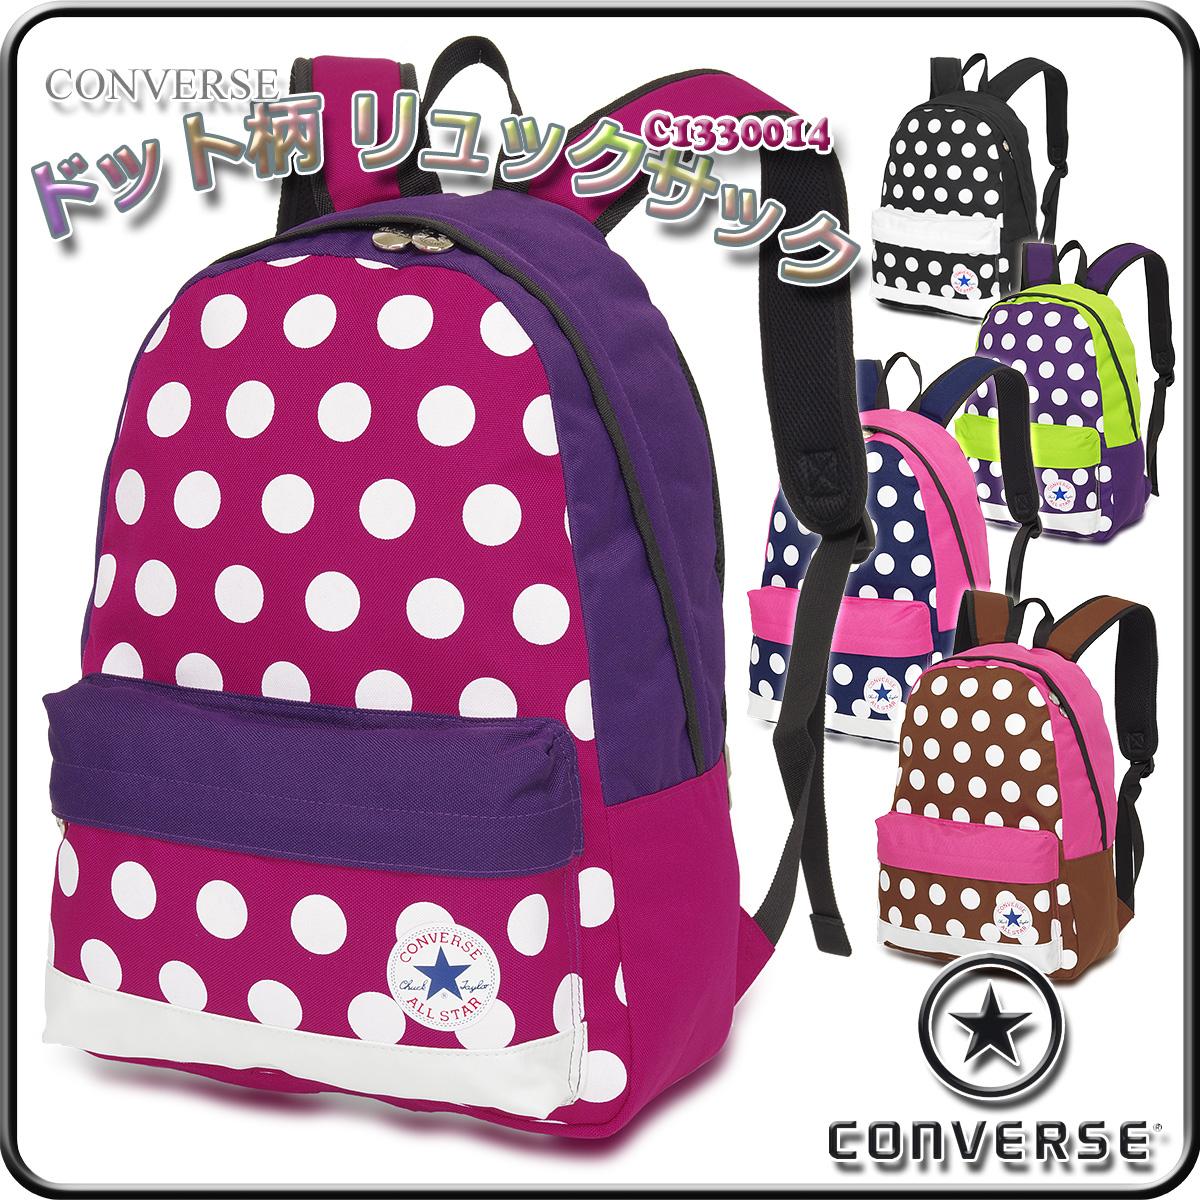 converse bag purple